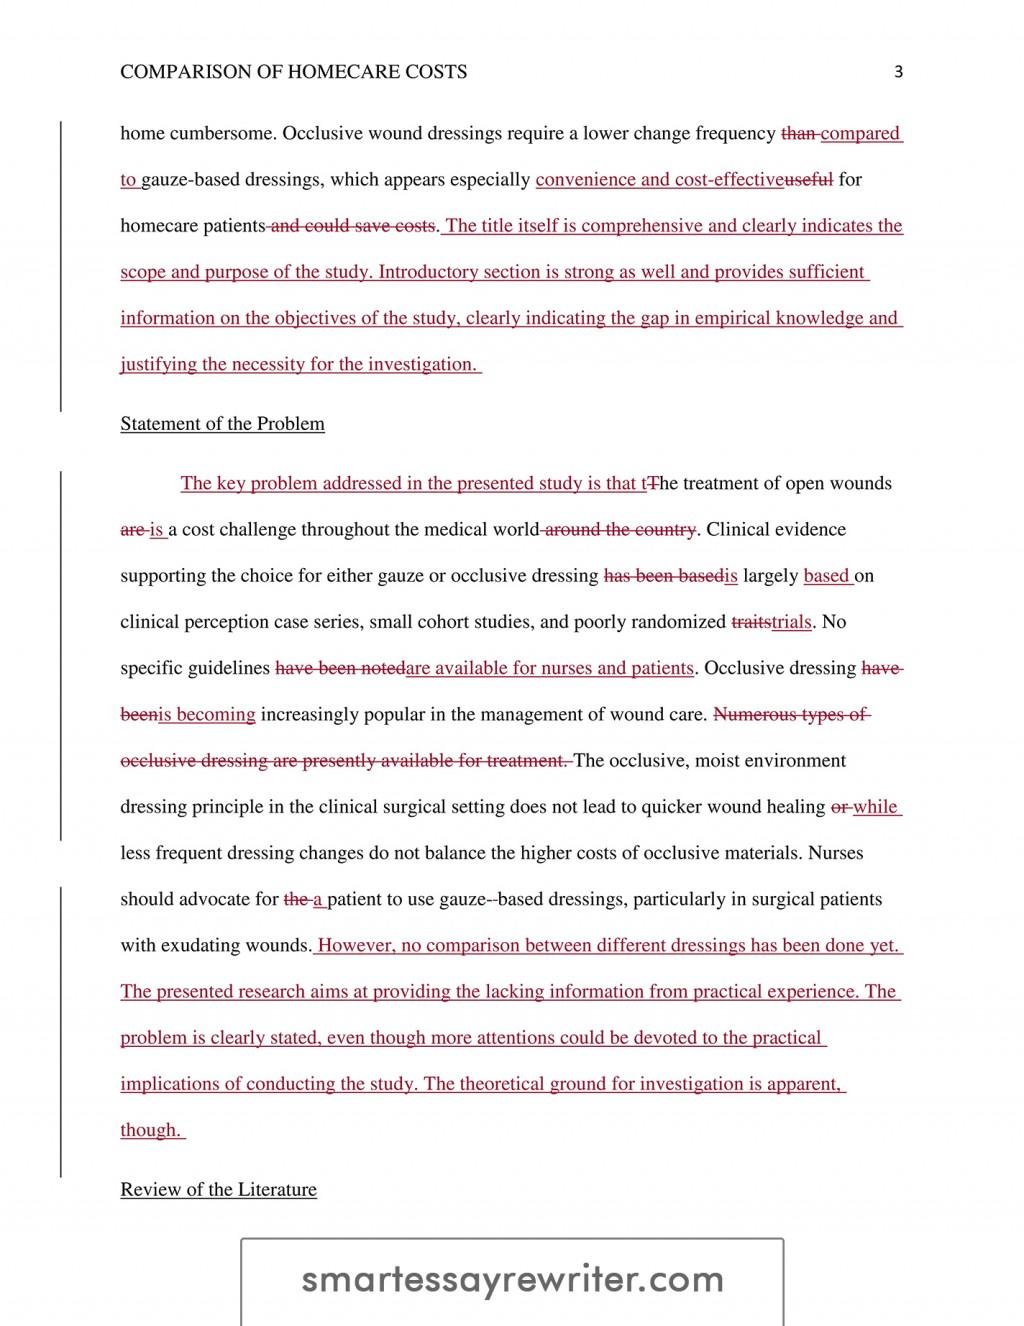 007 Essay Example Rewriter Smartessayrewriter Com Singular Free Software Crack Generator Large